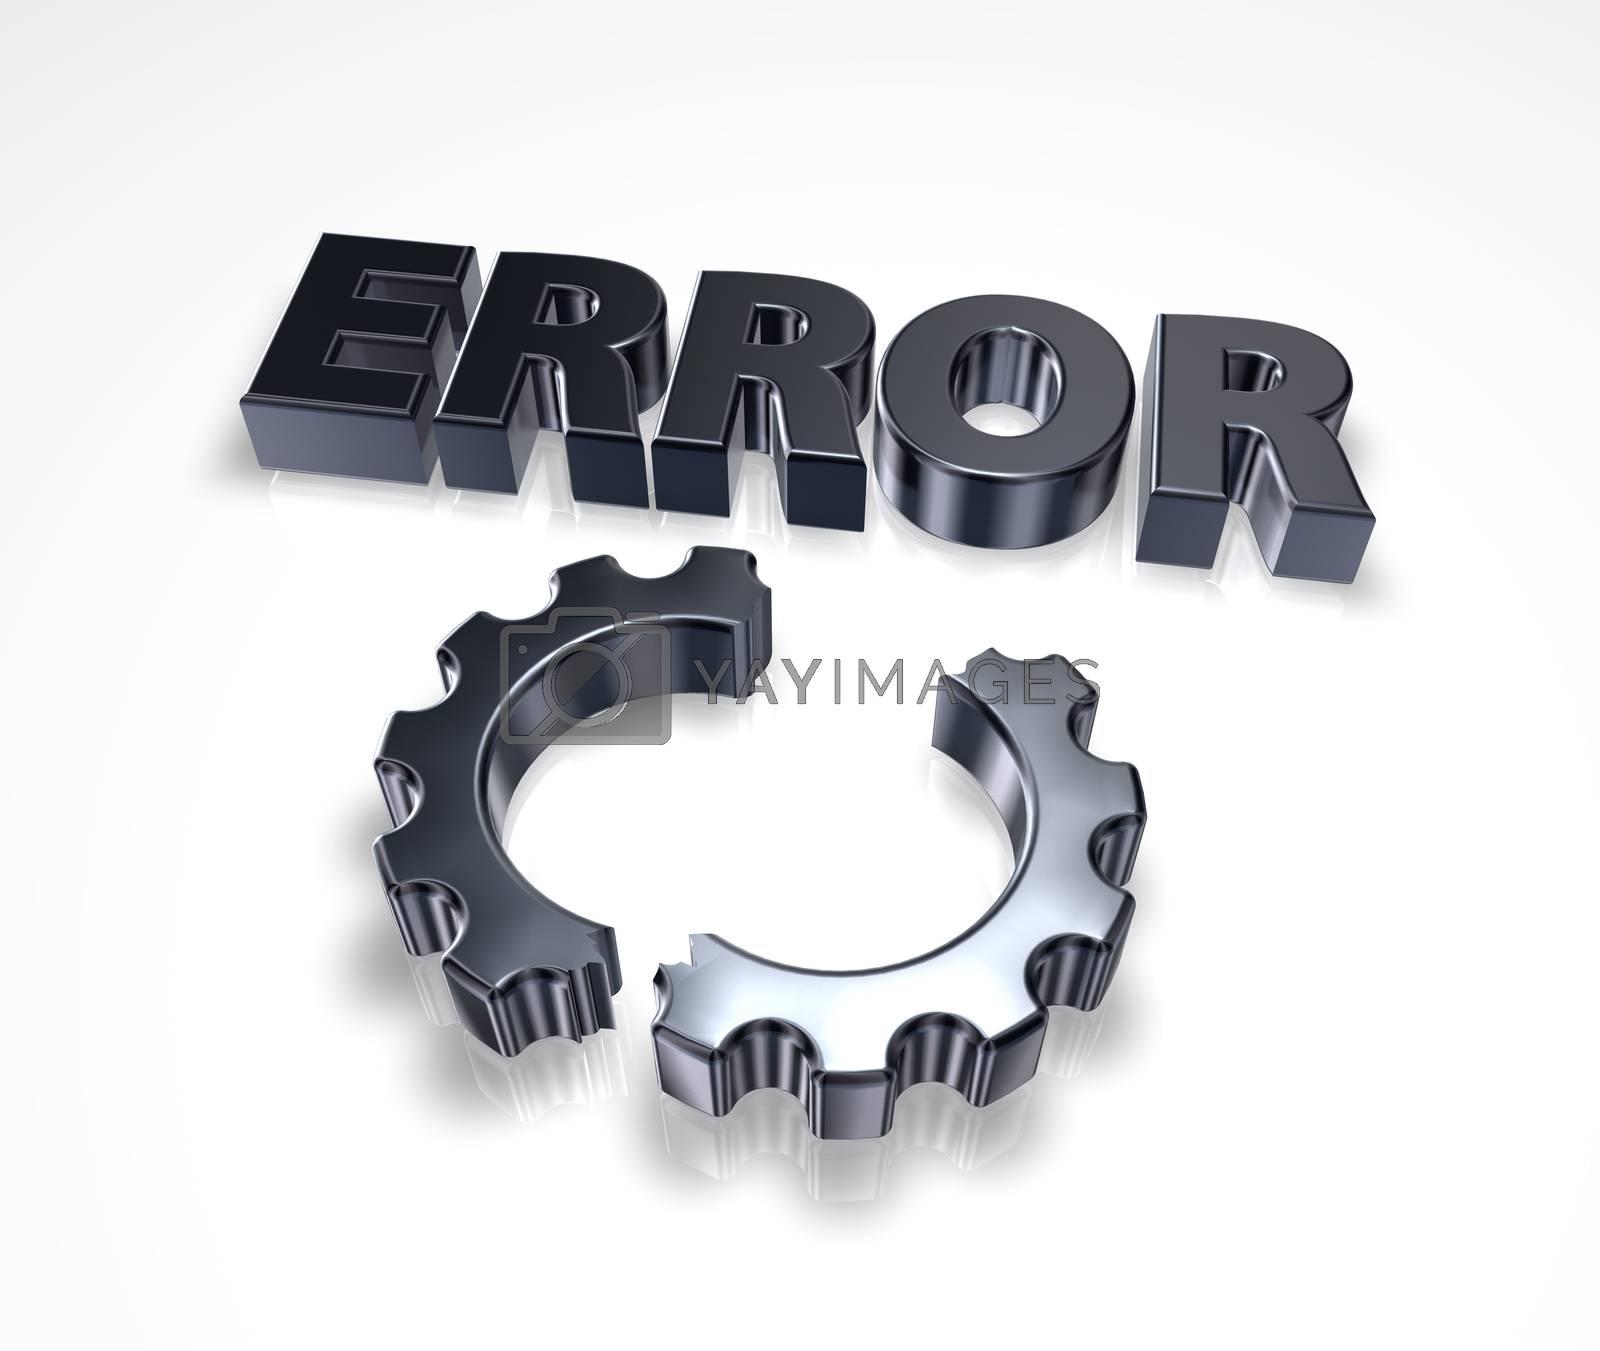 error message and broken cogwheel - 3d illustration